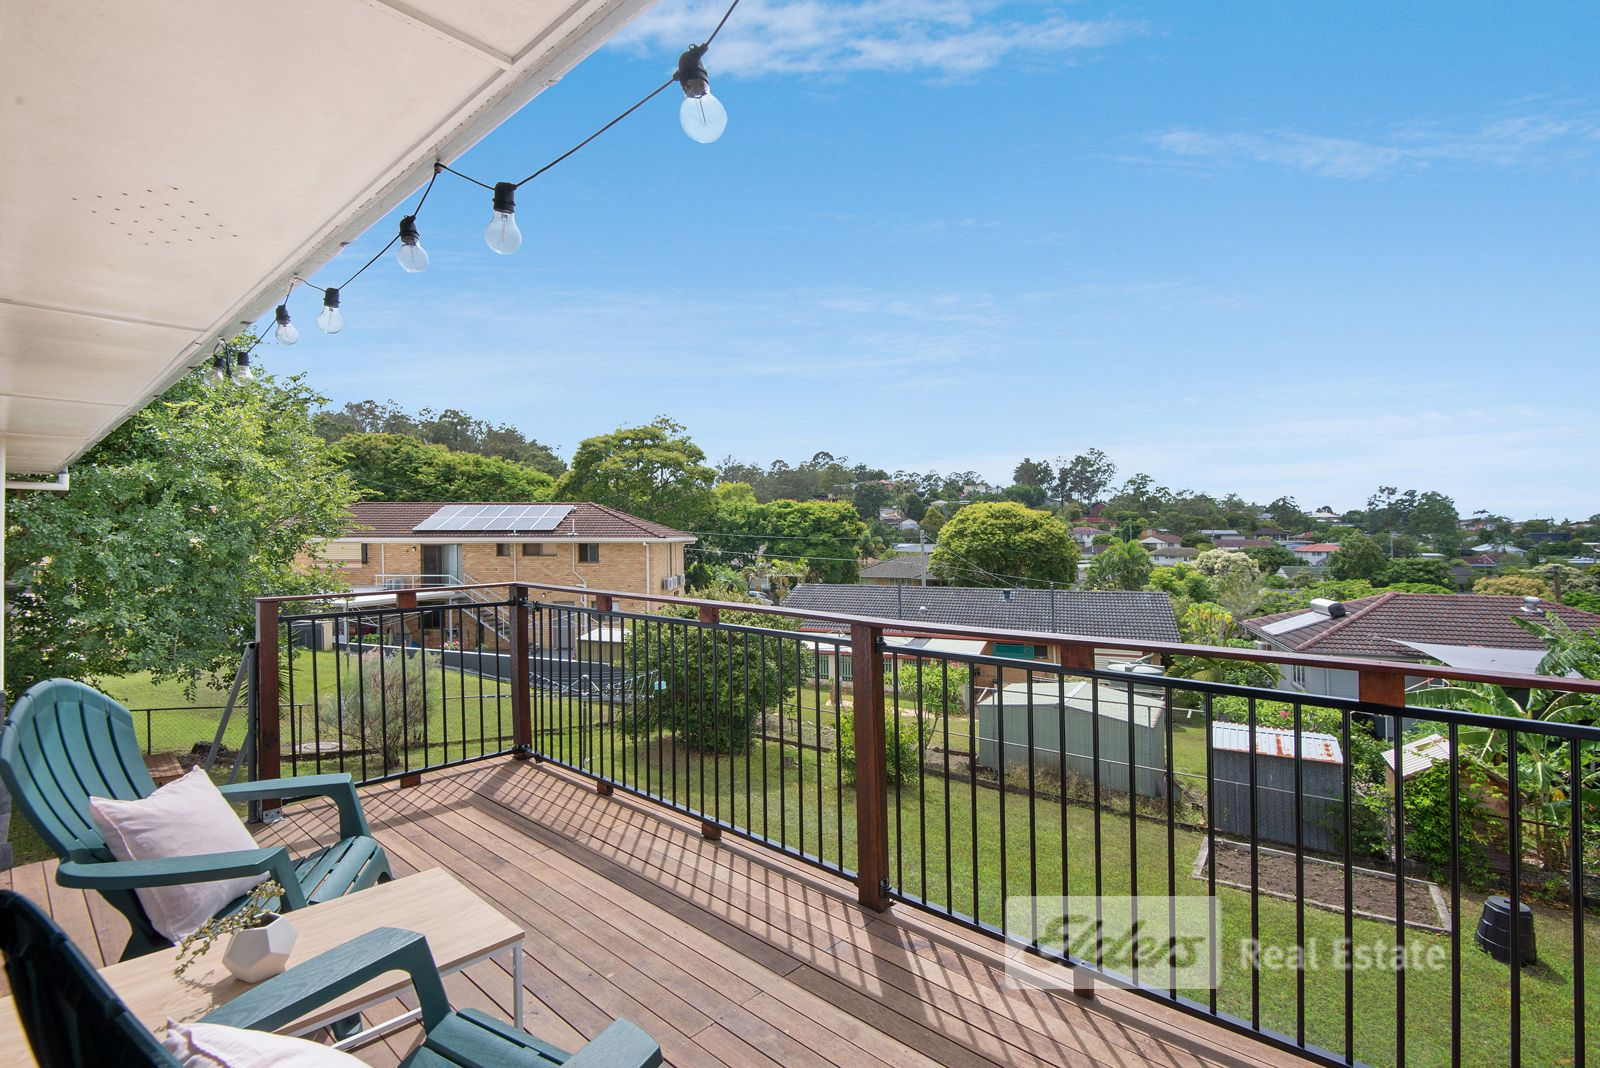 26 Hibiscus St, Everton Hills QLD 4053, Image 1